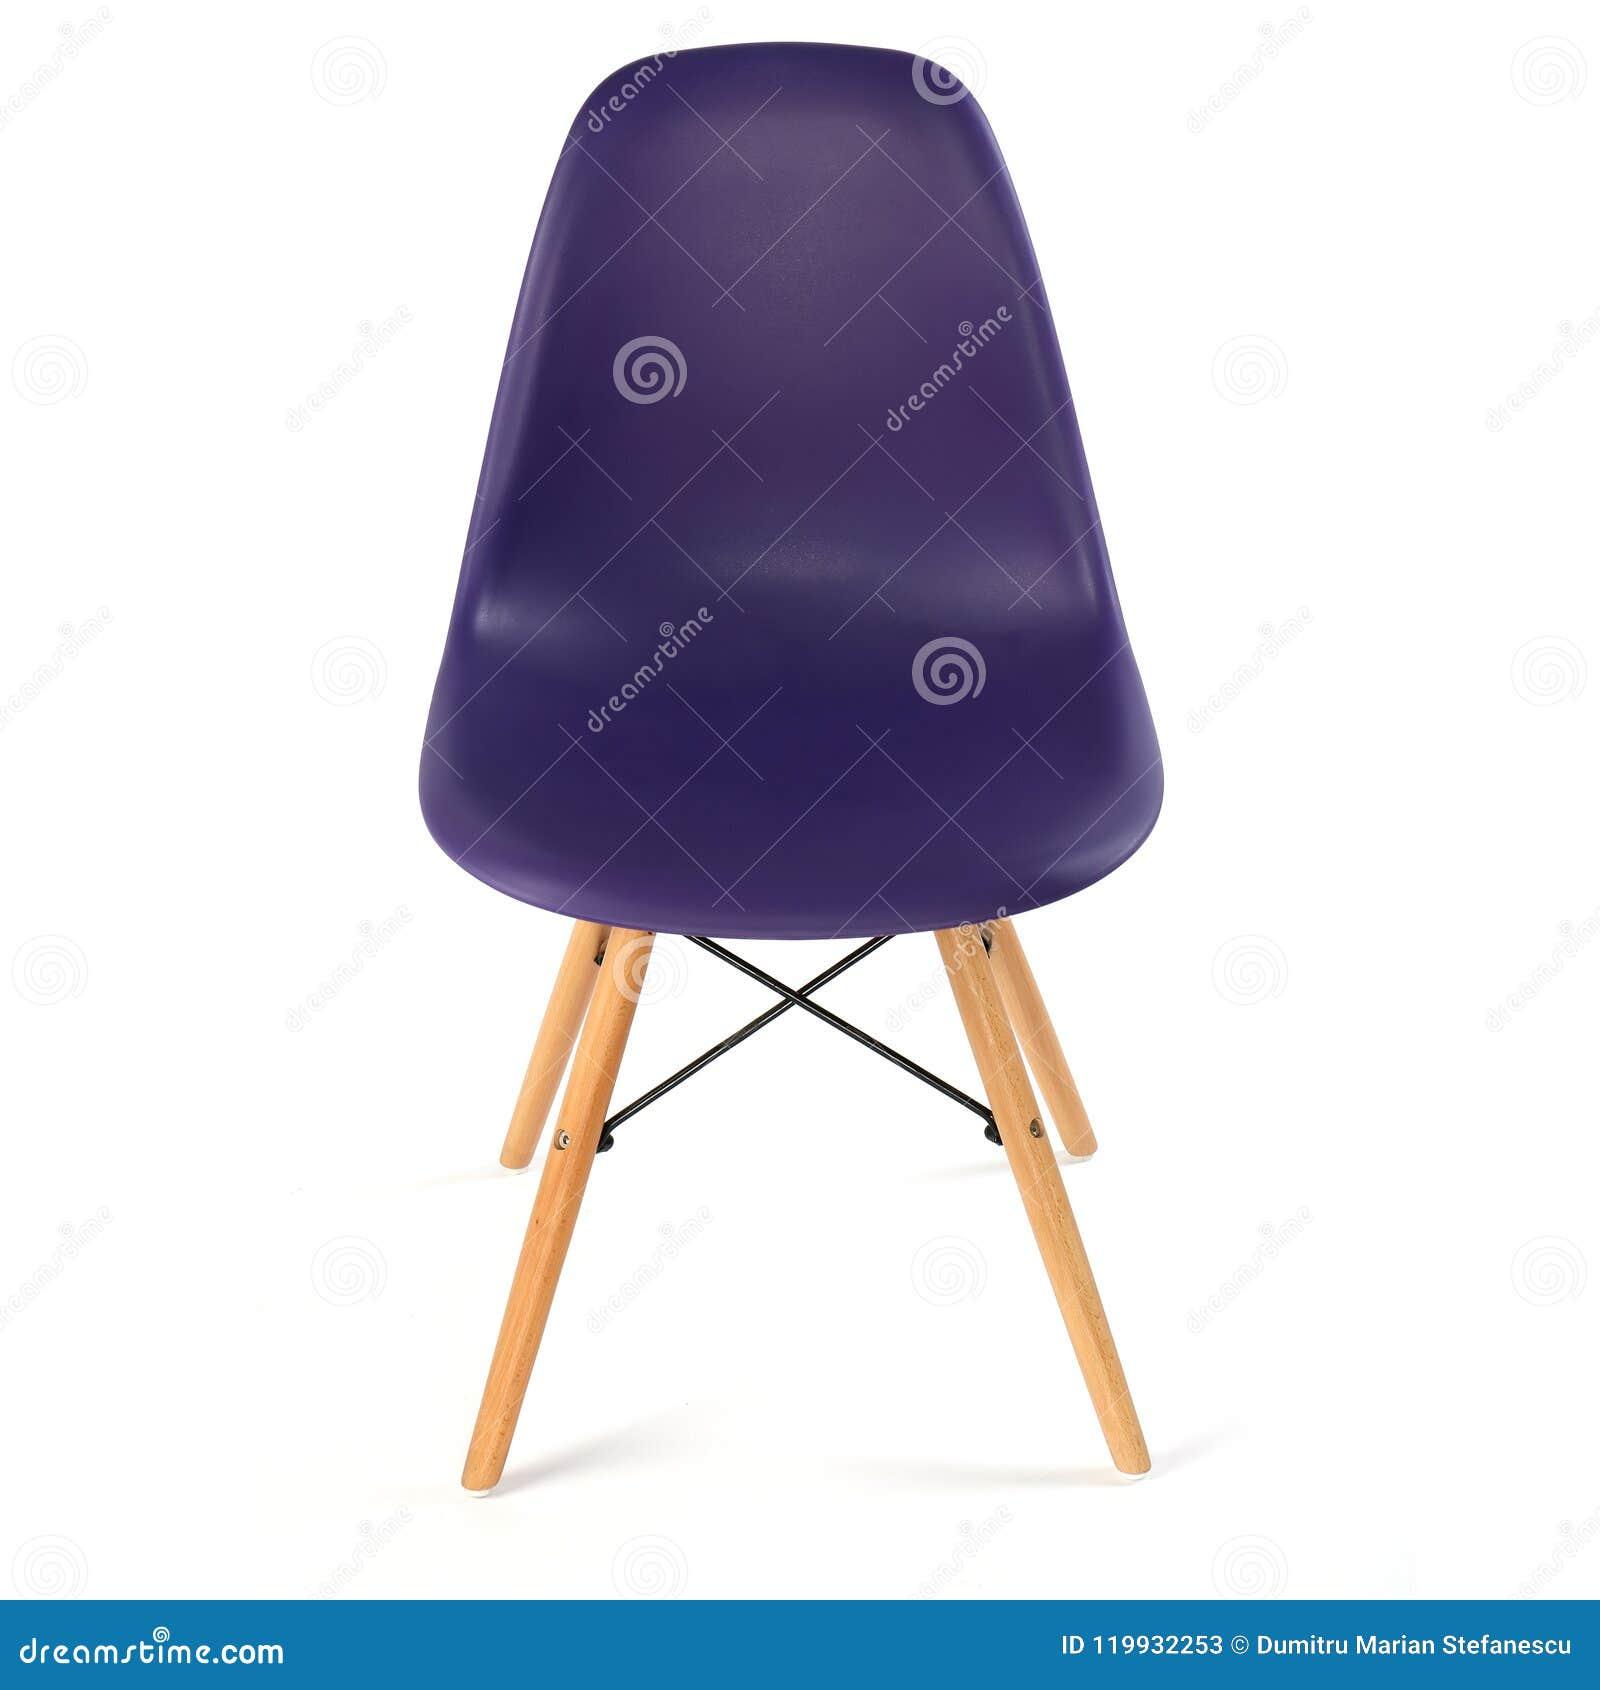 Peachy Modern Designer Chair Isolated On White Background Stock Ibusinesslaw Wood Chair Design Ideas Ibusinesslaworg